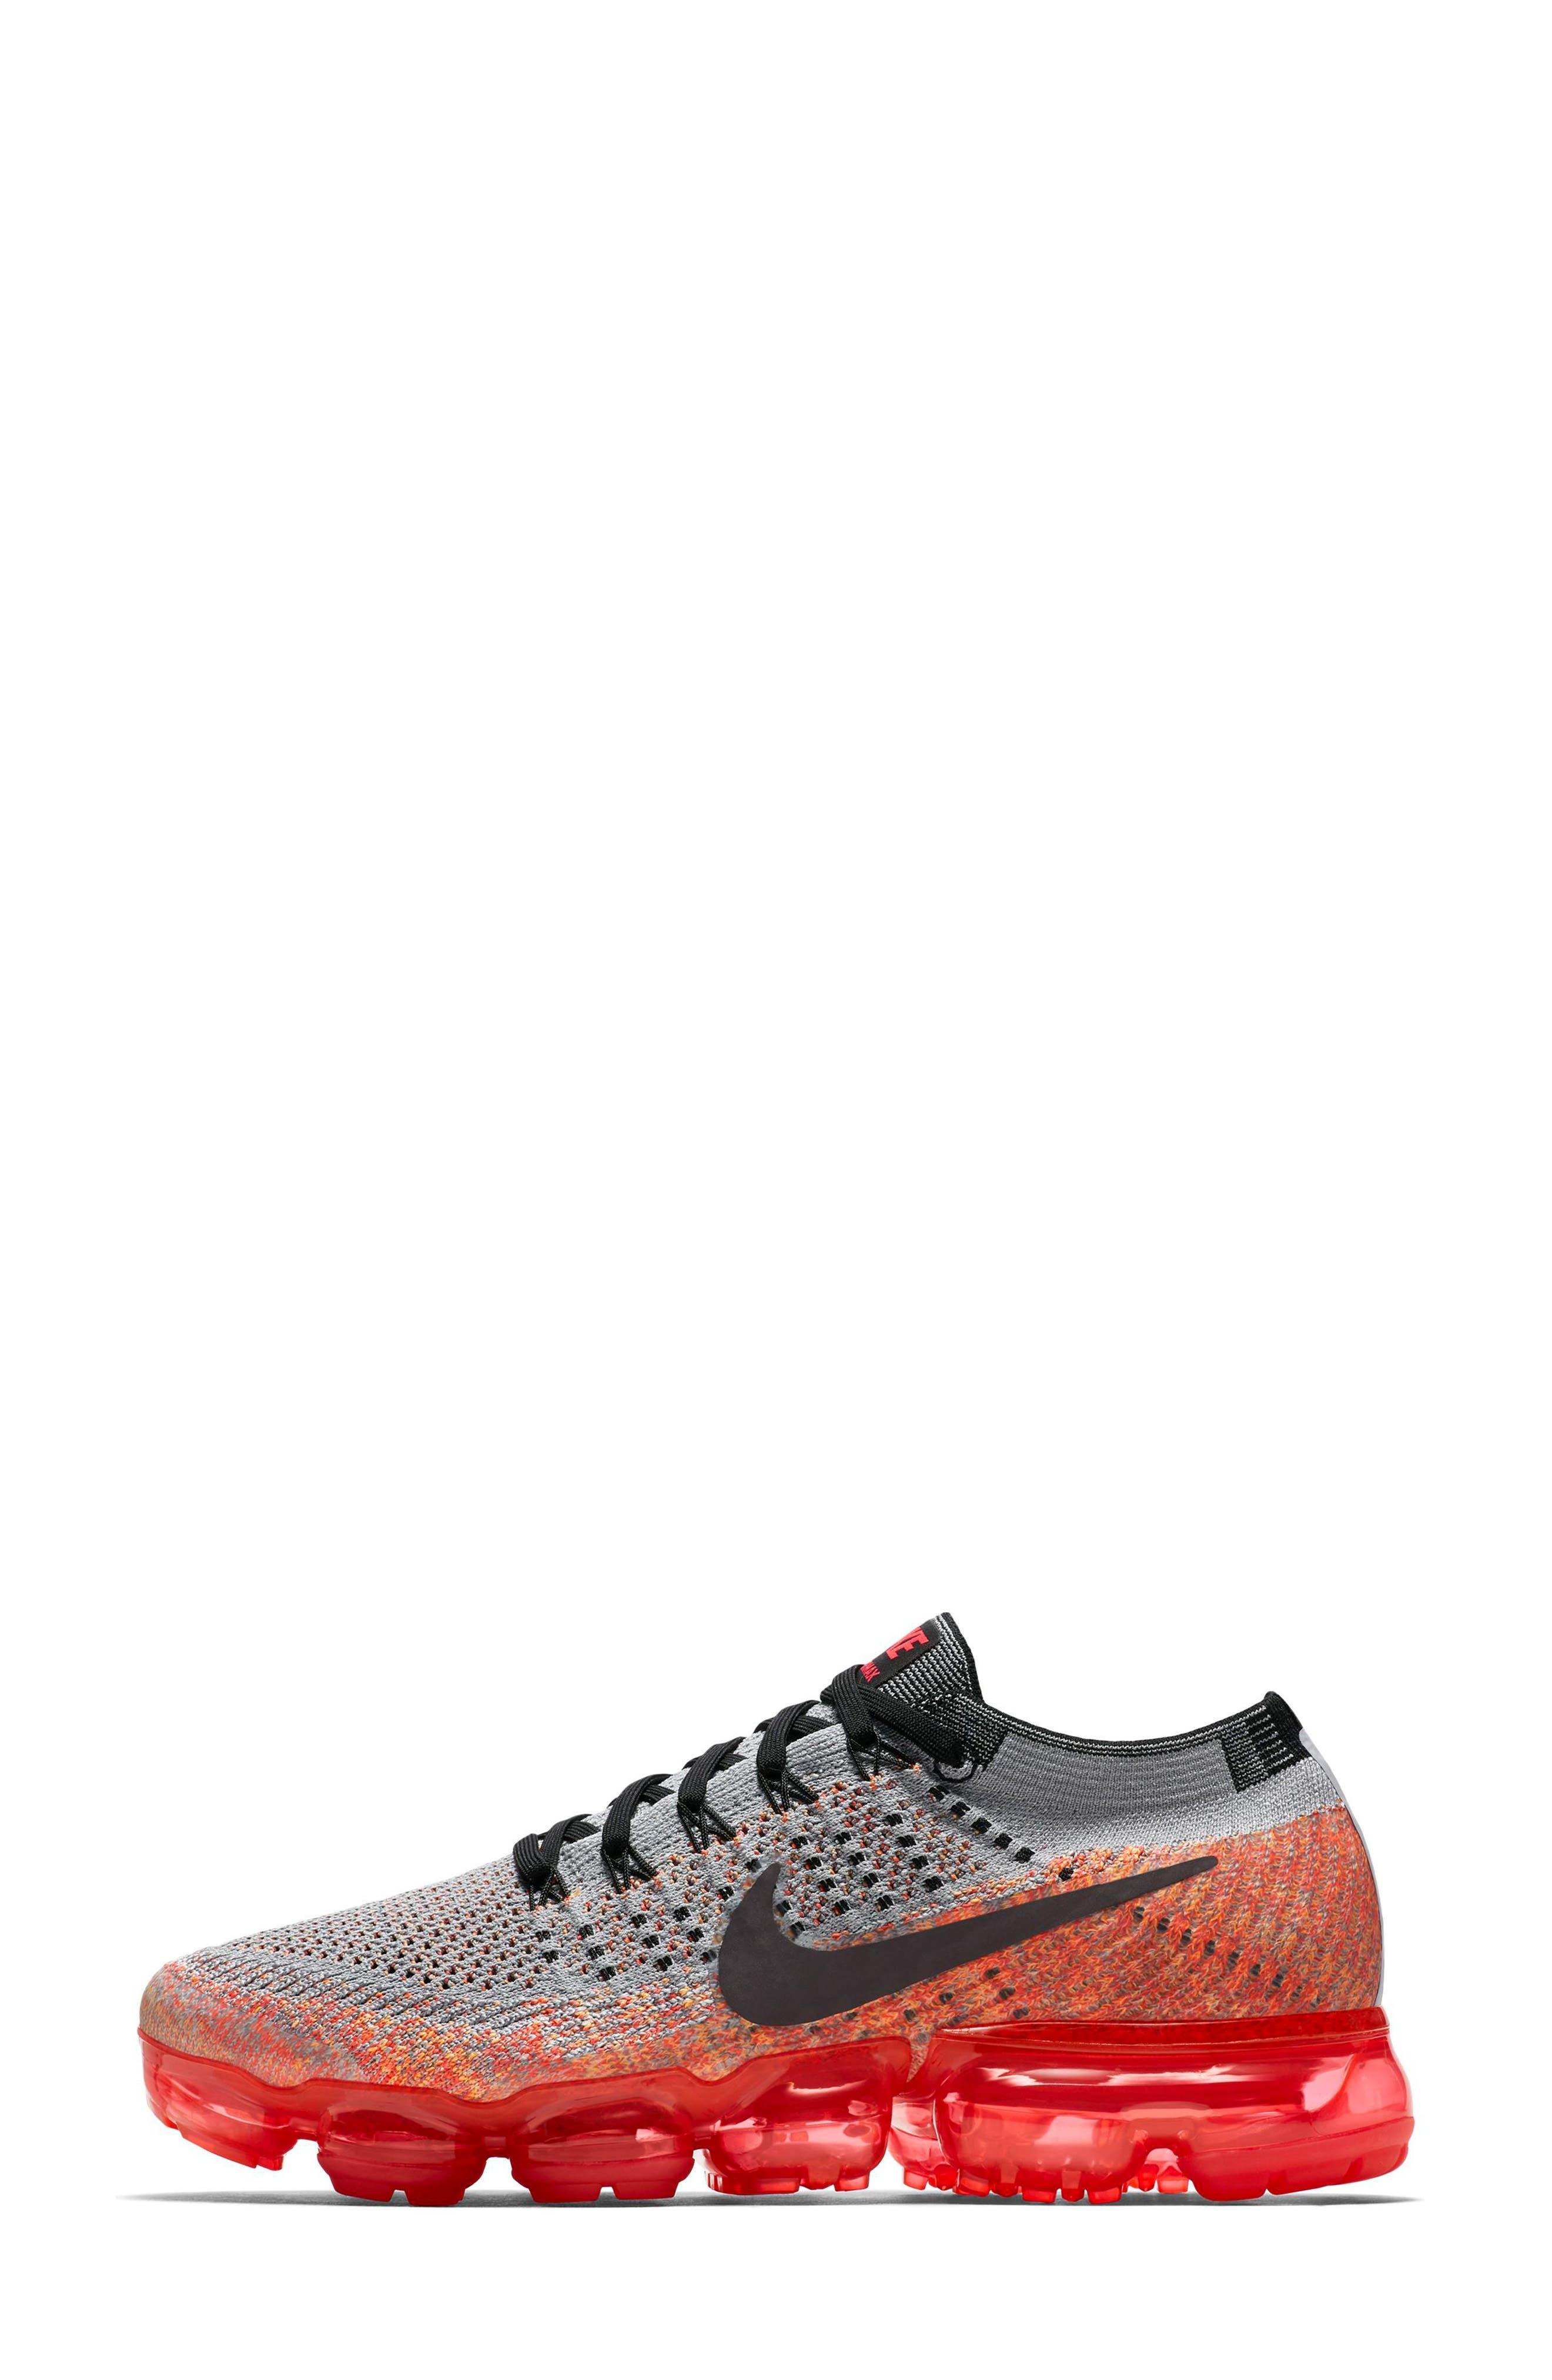 Nike Vapormax De Blanco Madre 2018 Nordstrom venta 2014 unisex entrega rápida barato vBbNfiXr